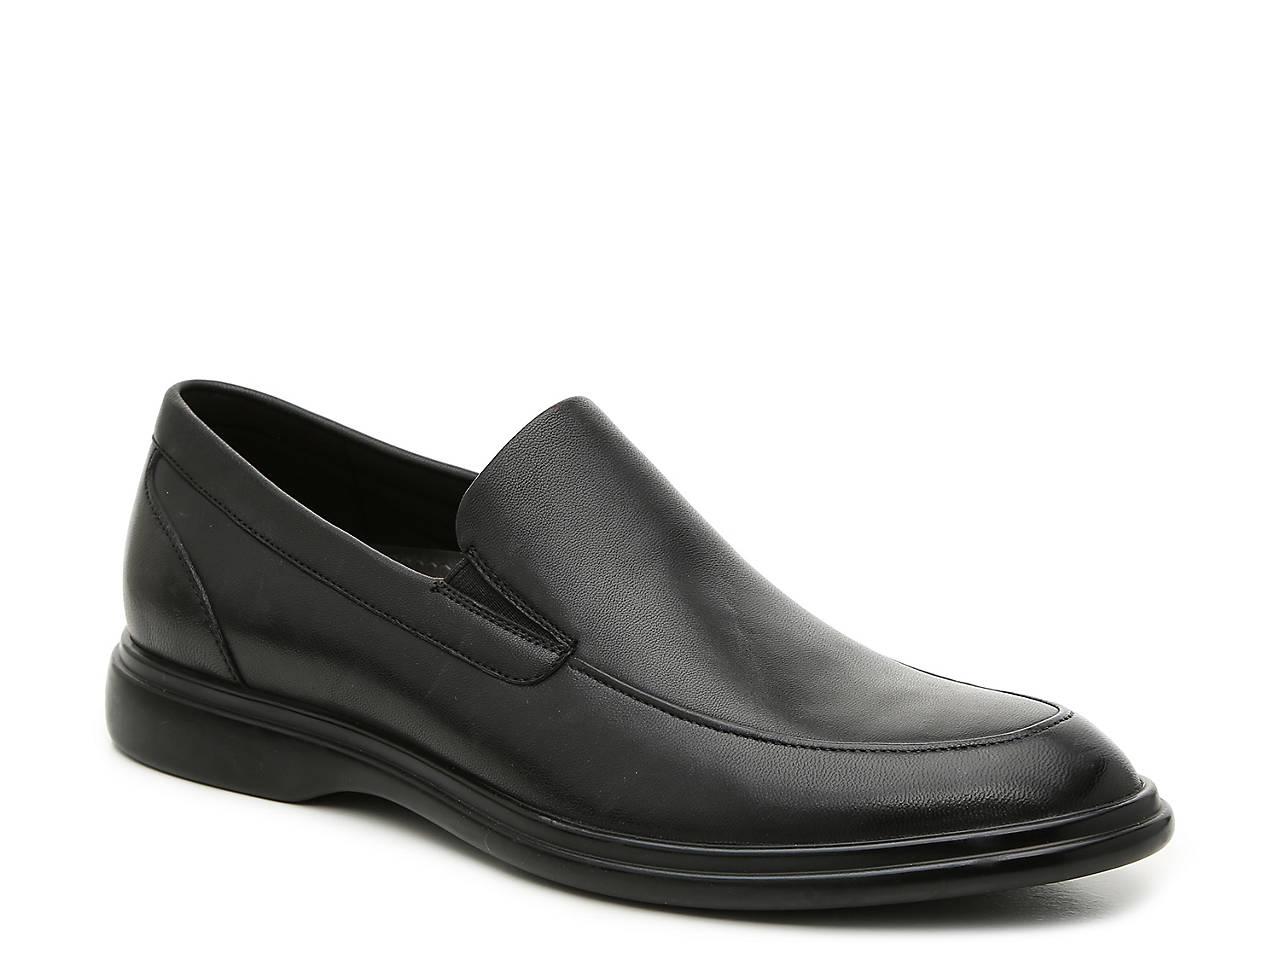 bca8b3181824 CS Tandem Justin Slip-On Men s Shoes